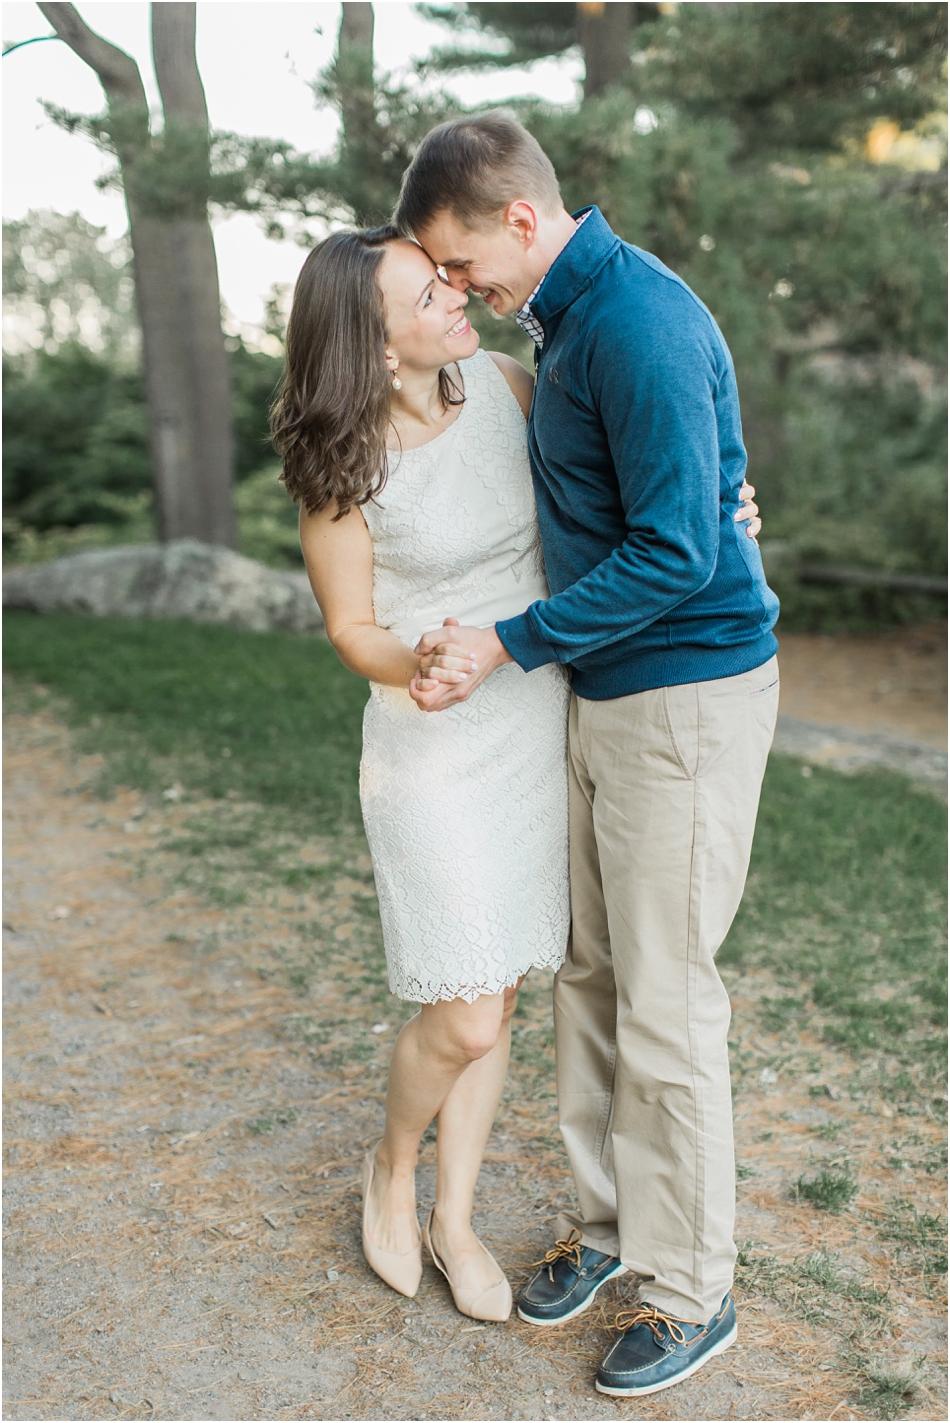 arnold_arboretum_engagement_dylan_mariana_cape_cod_boston_new_england_wedding_photographer_Meredith_Jane_Photography_photo_2665.jpg